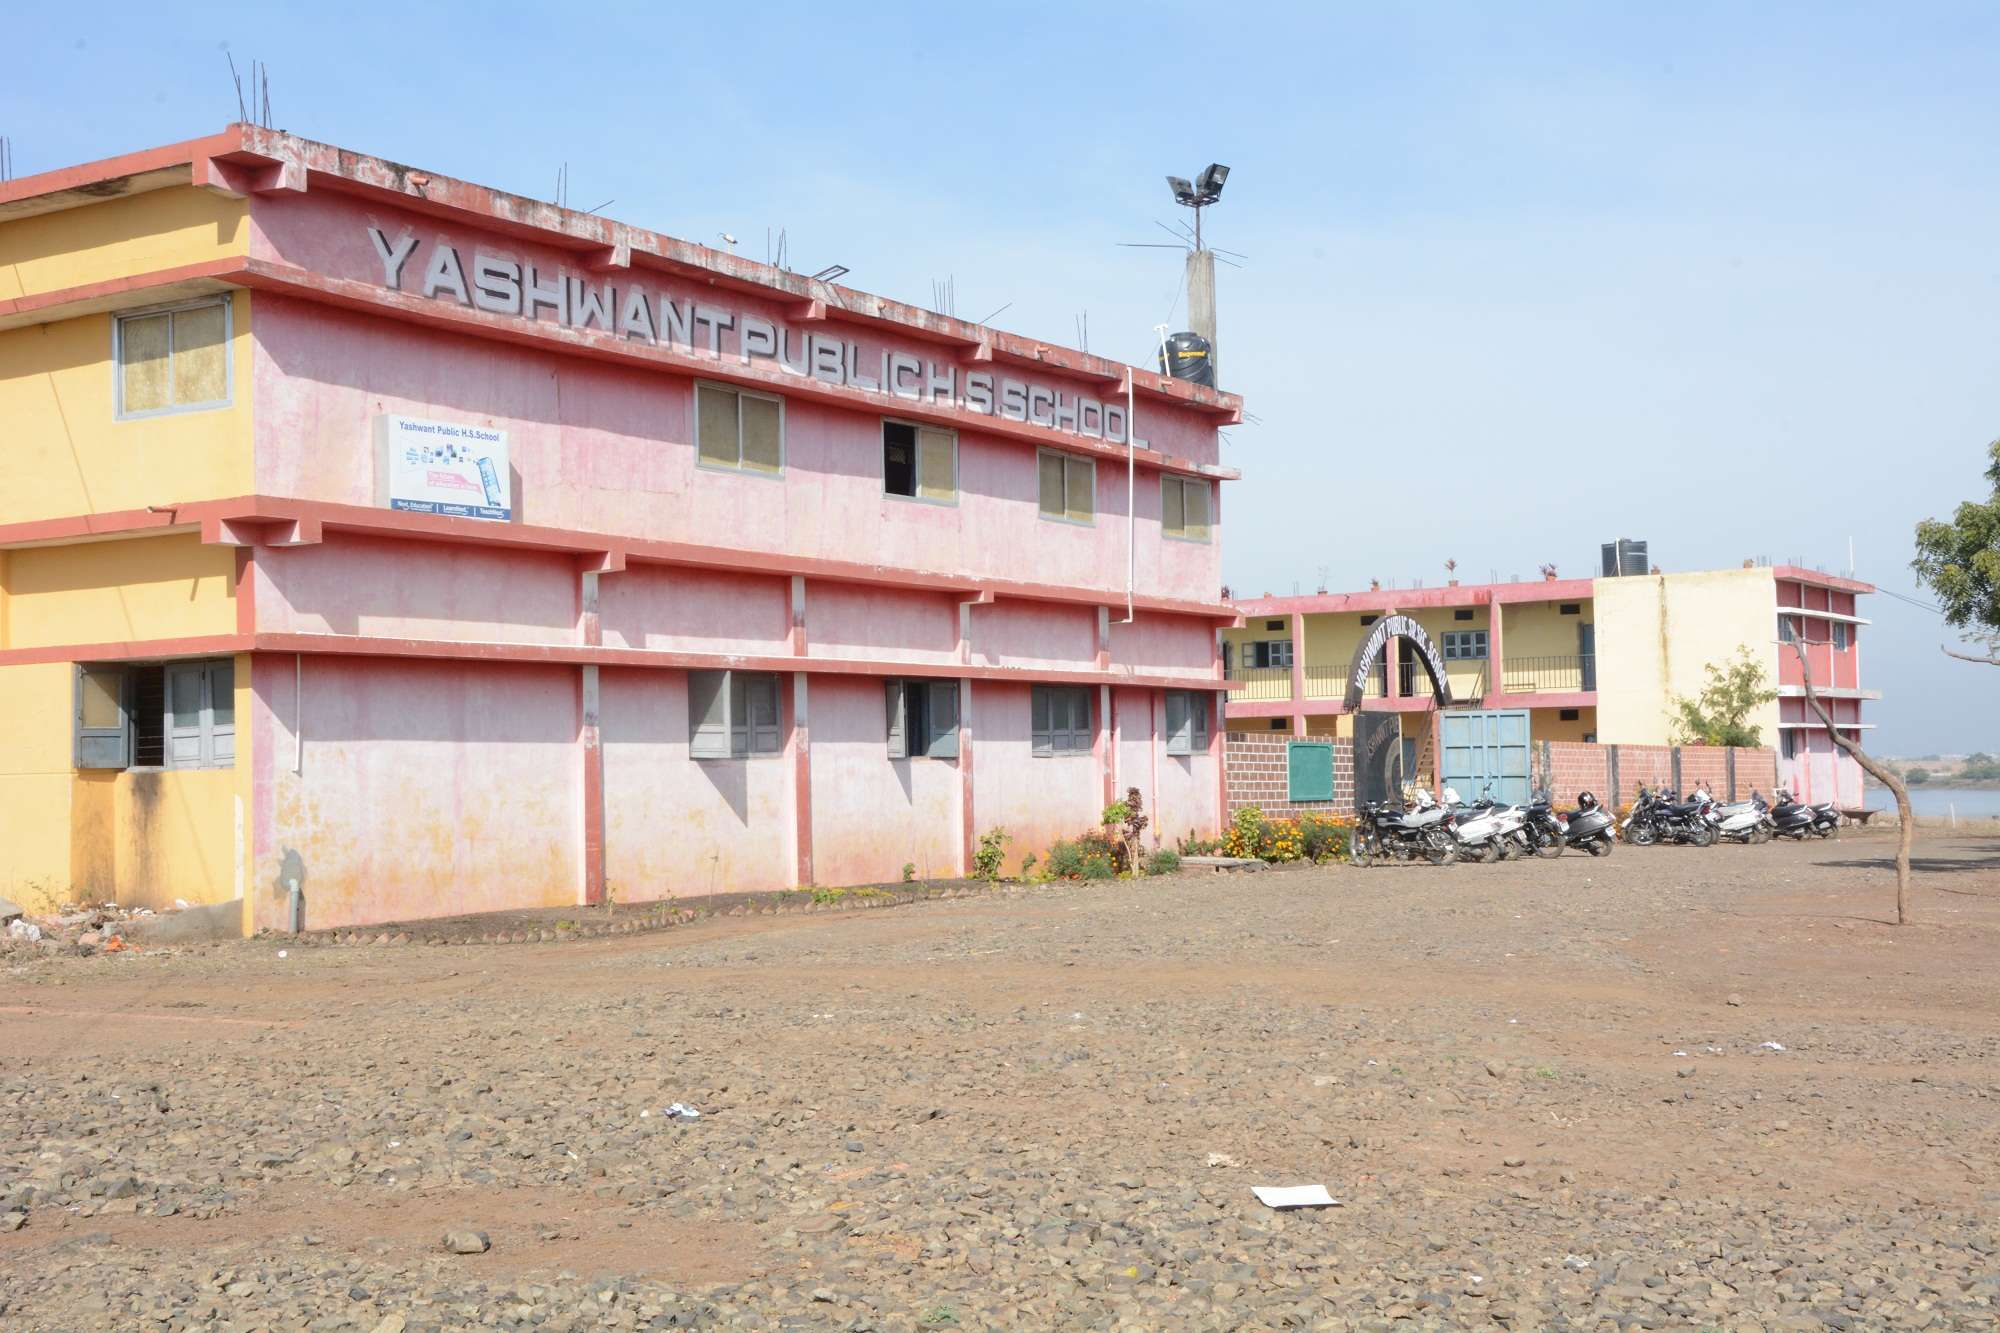 Yashwant Public School MHOW South Shanti Nagar Mhowgaon MHOW 1030627